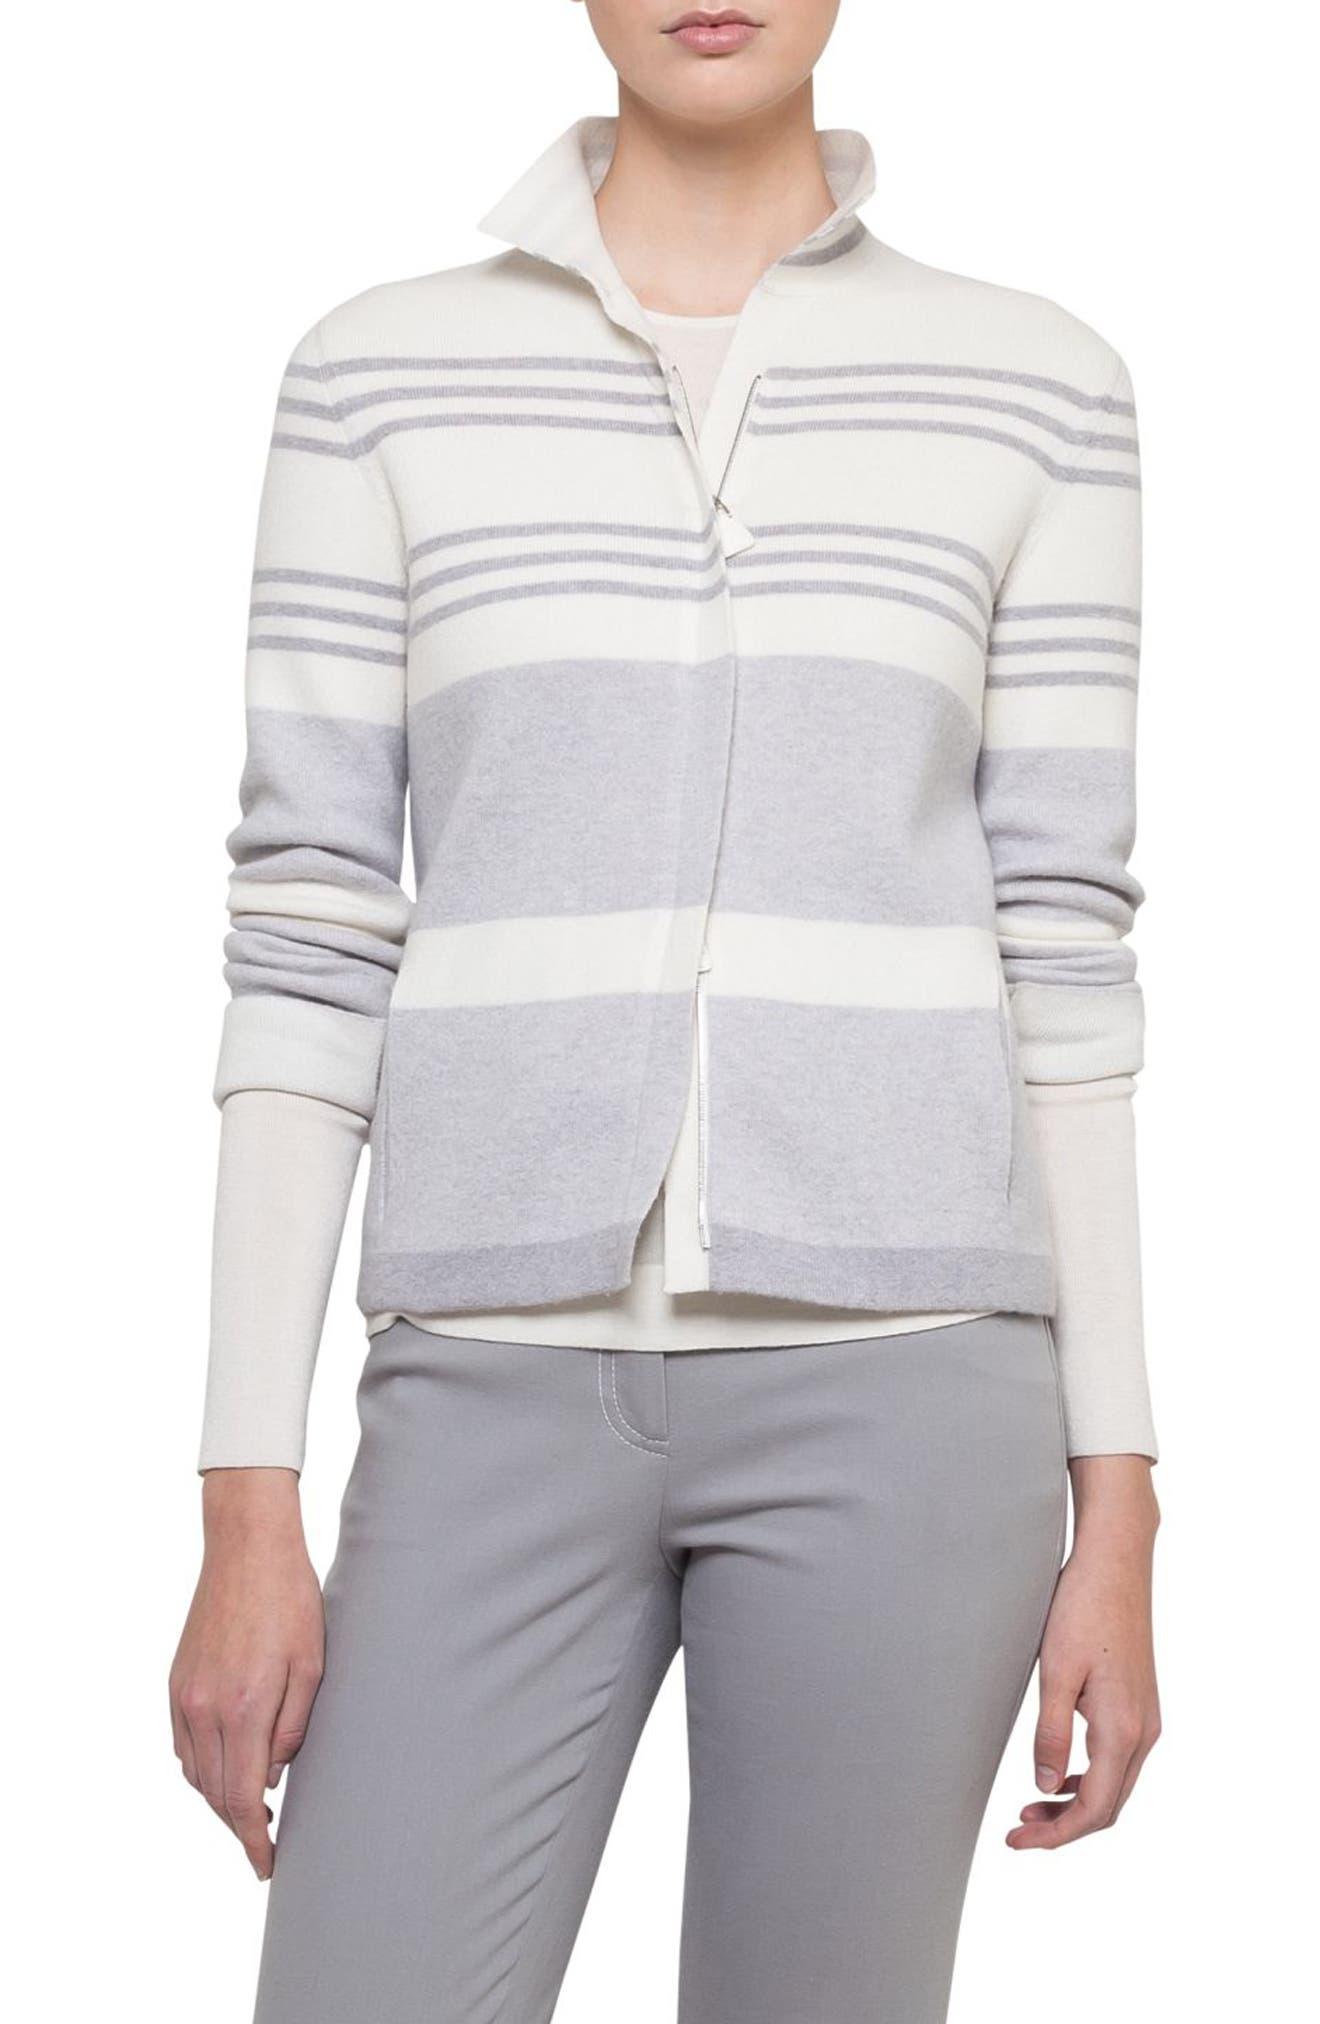 Stripe Knit Cashmere Jacket,                             Main thumbnail 1, color,                             020